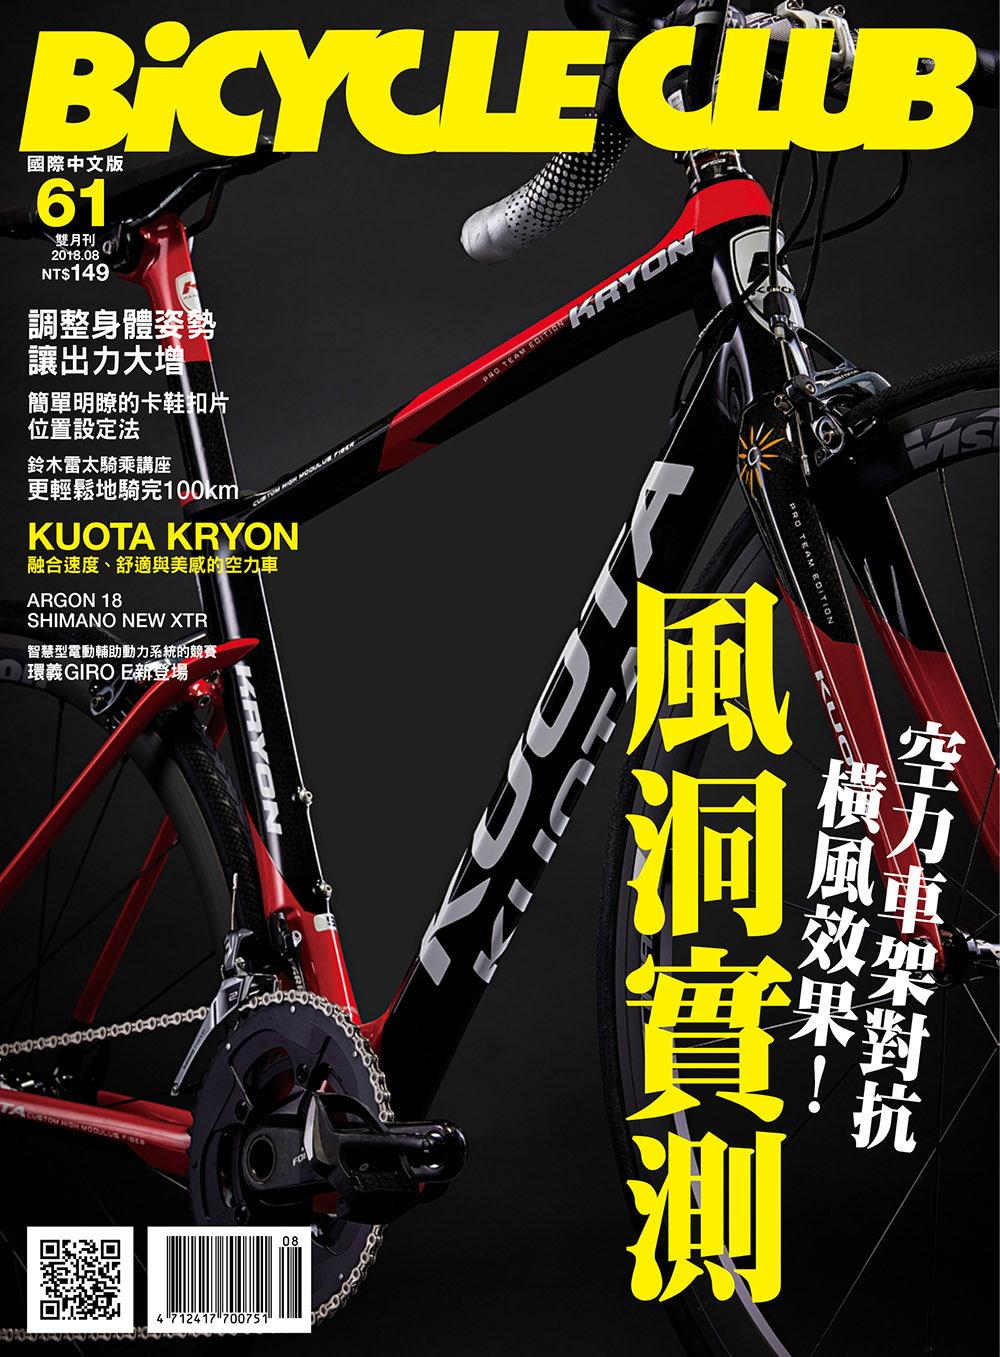 bicycle club單車俱樂部 8月號/2018第61期